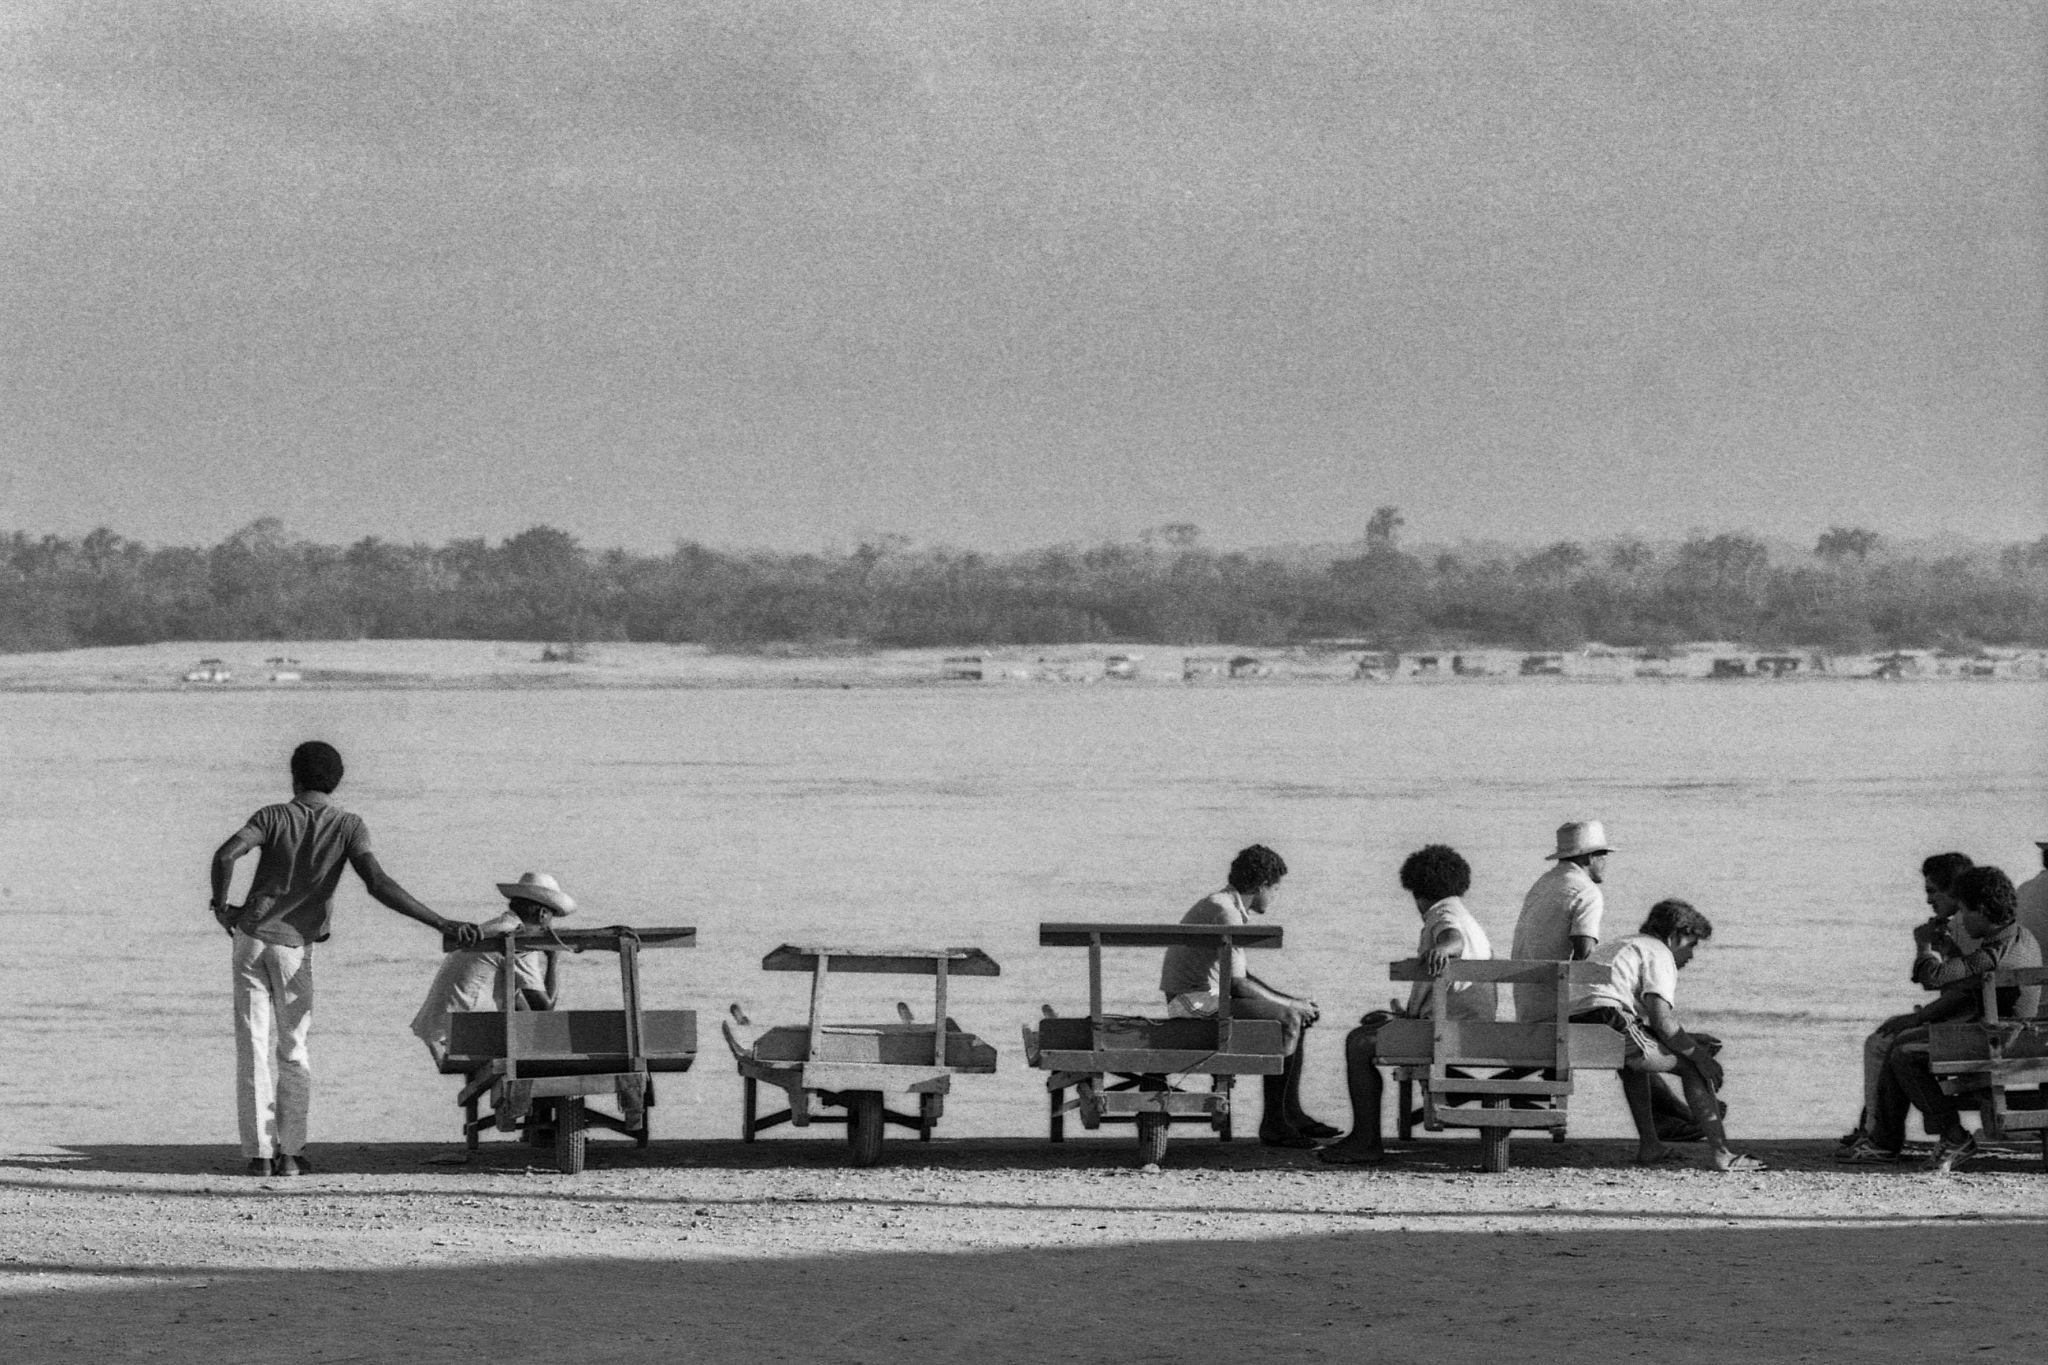 rio-tocantins---marabá-1981-810048---22